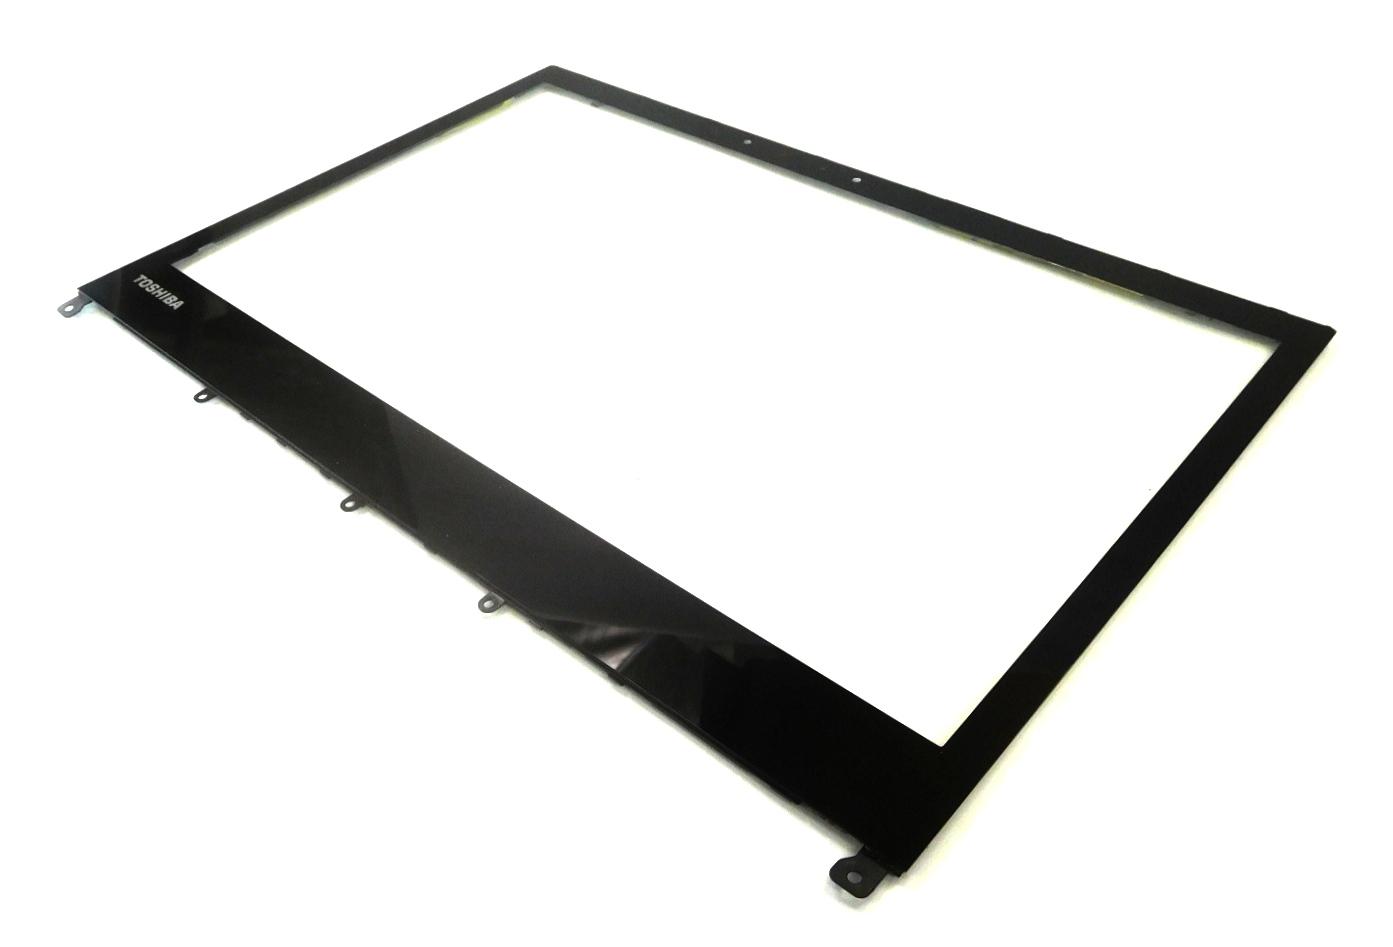 New for Toshiba Satellite Radius 12 P20W-C P20W-C-106 Touch Screen Digitizer